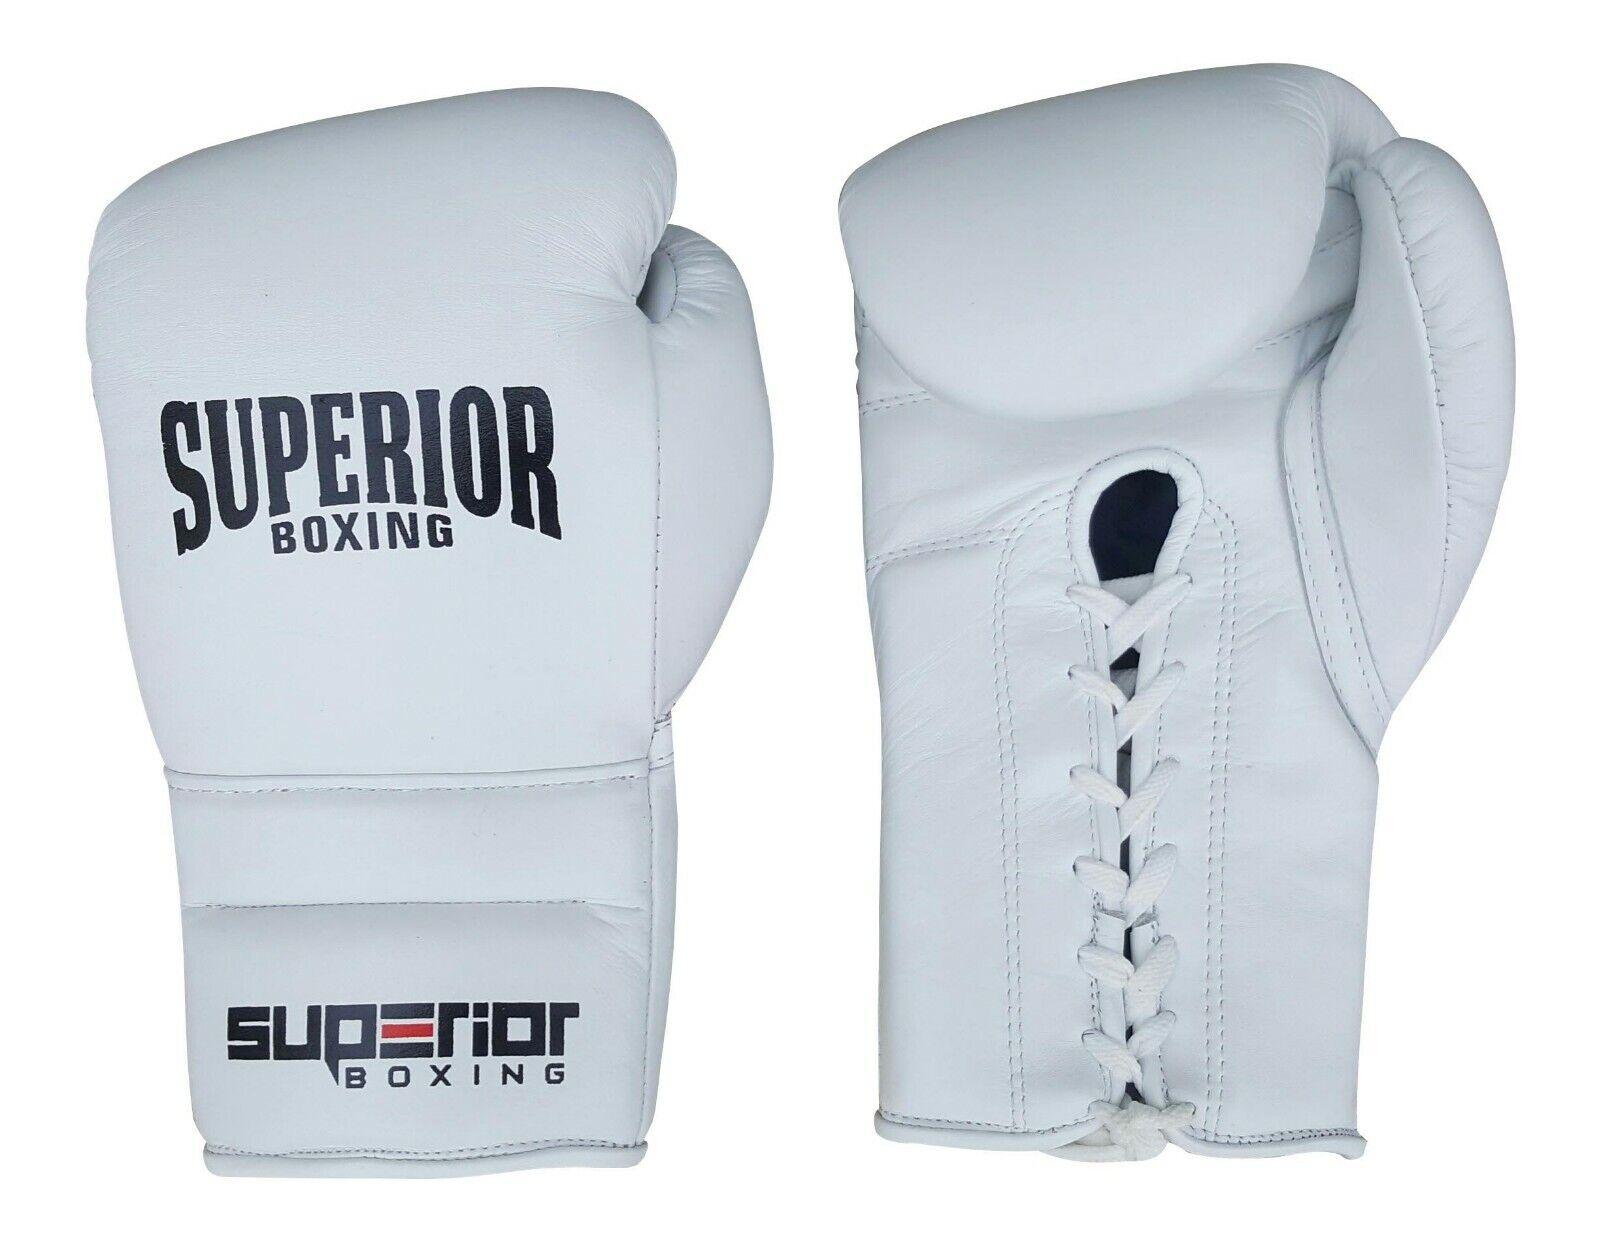 Superior Professional Lace up 12oz Sparring Boxhandschuhe gewinnen Boxhandschuhe